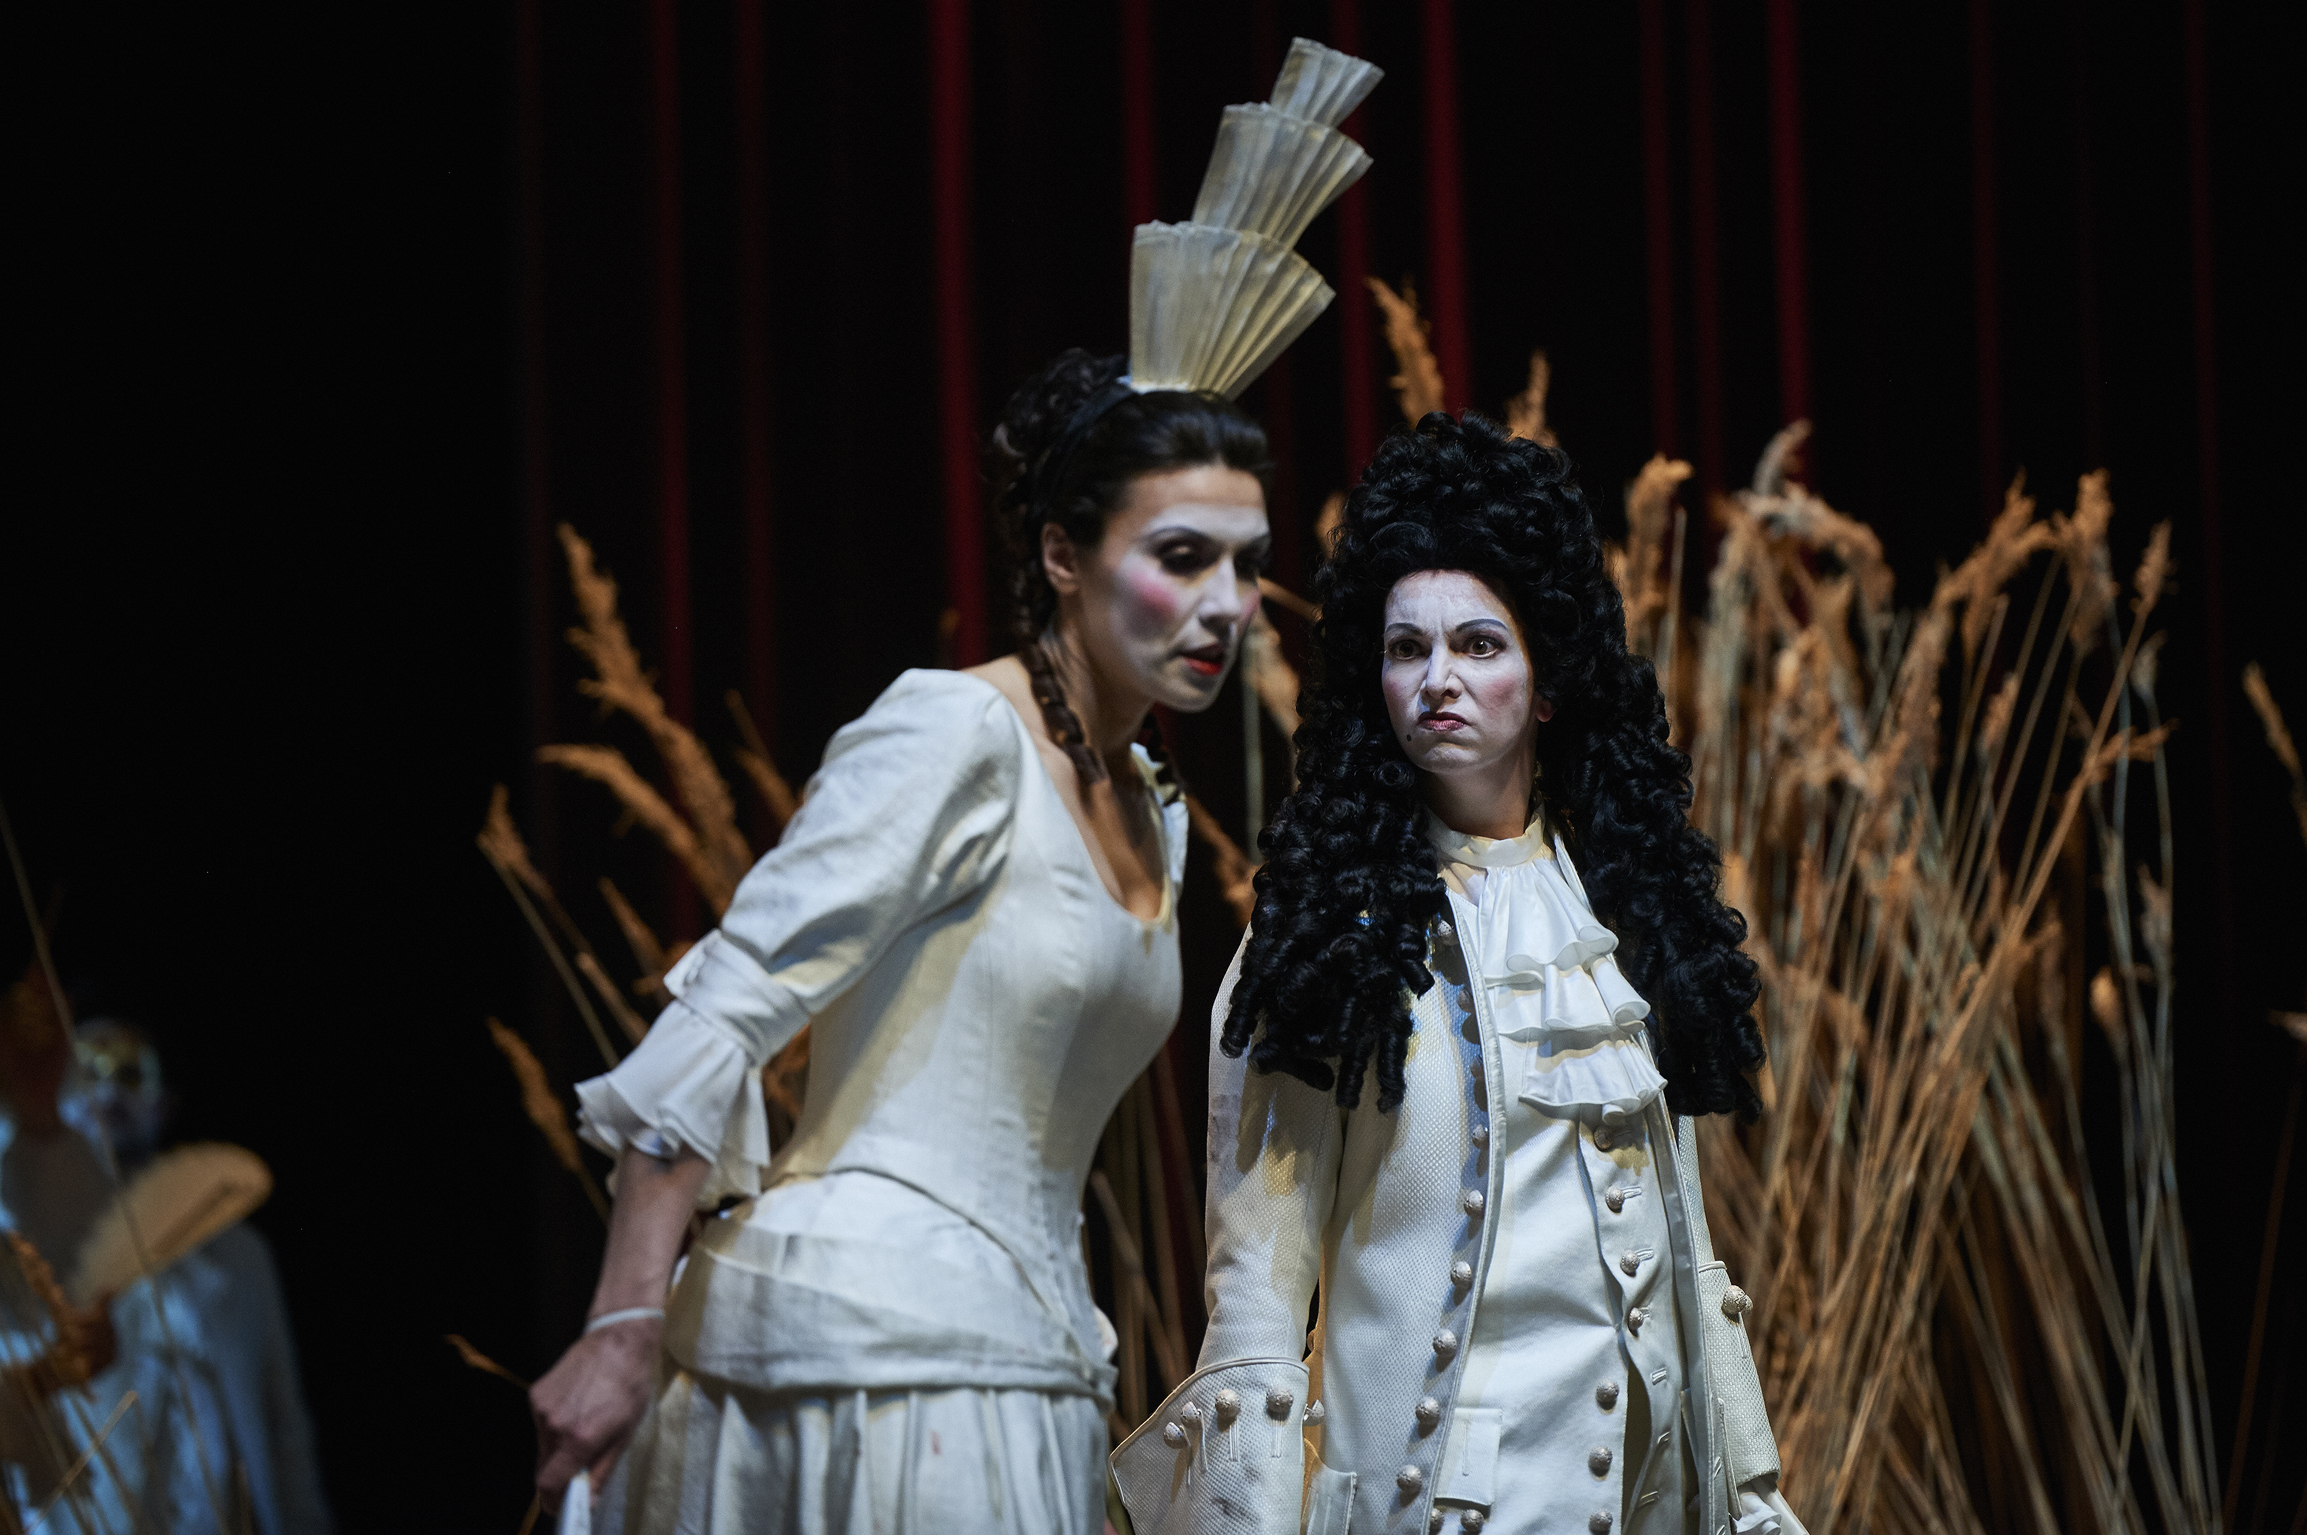 Steffani: Amor vien dal destino (Turno), Staatsoper Berlin